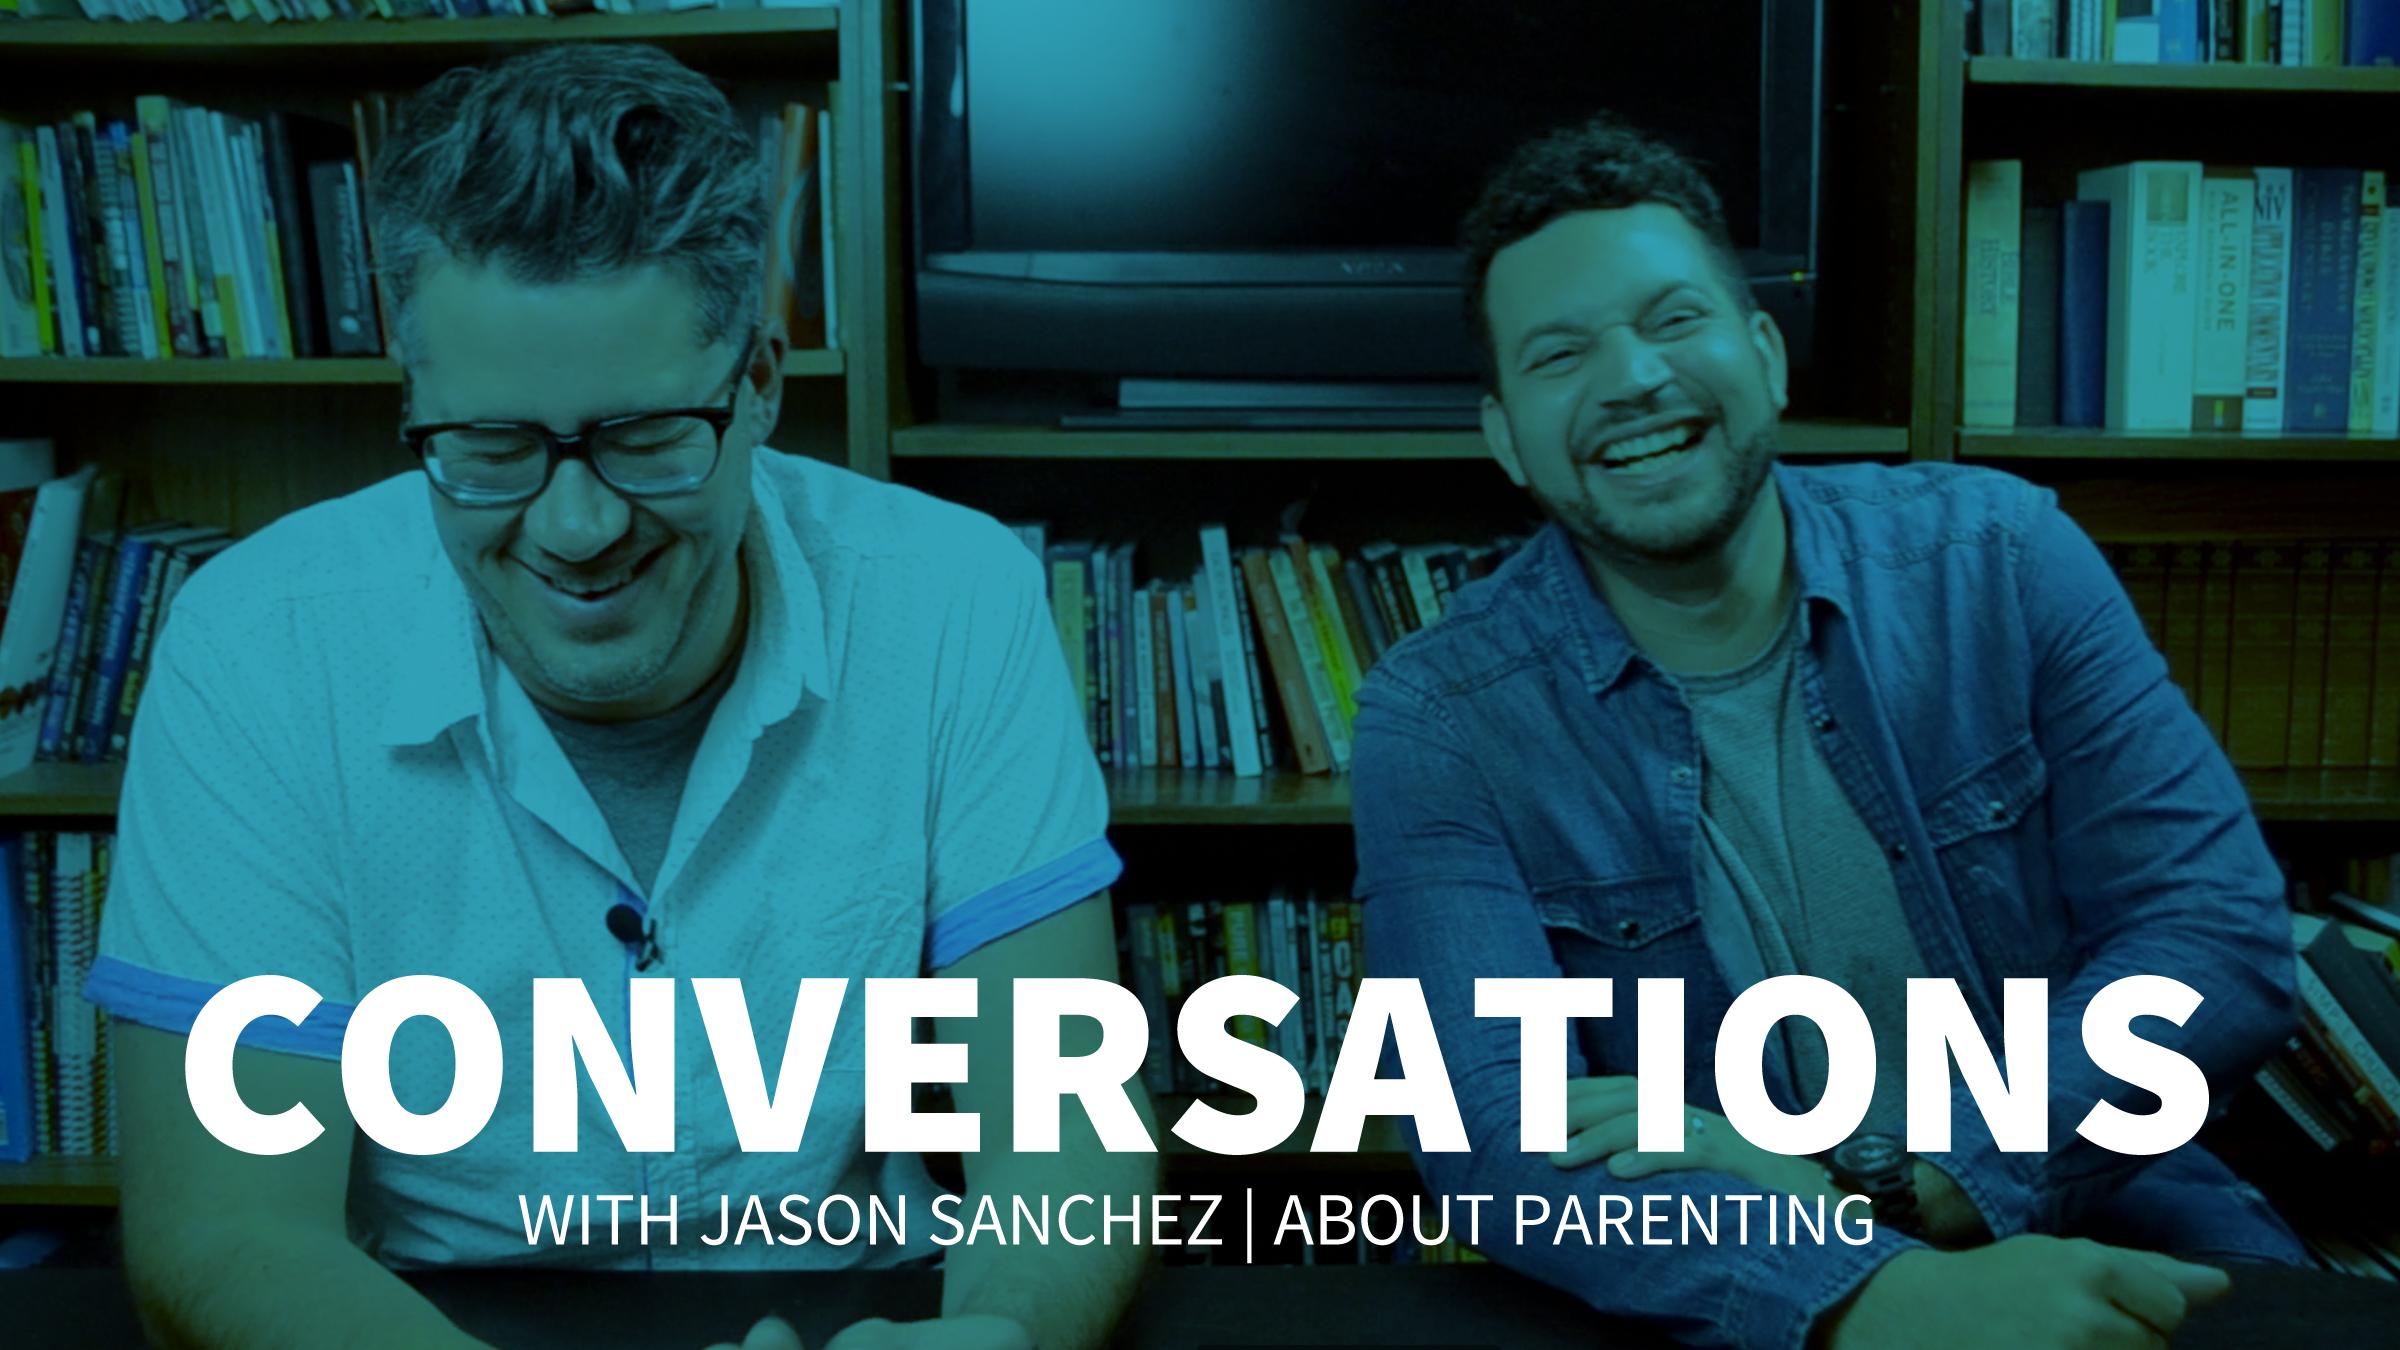 CONVERSATIONS with jason.jpg